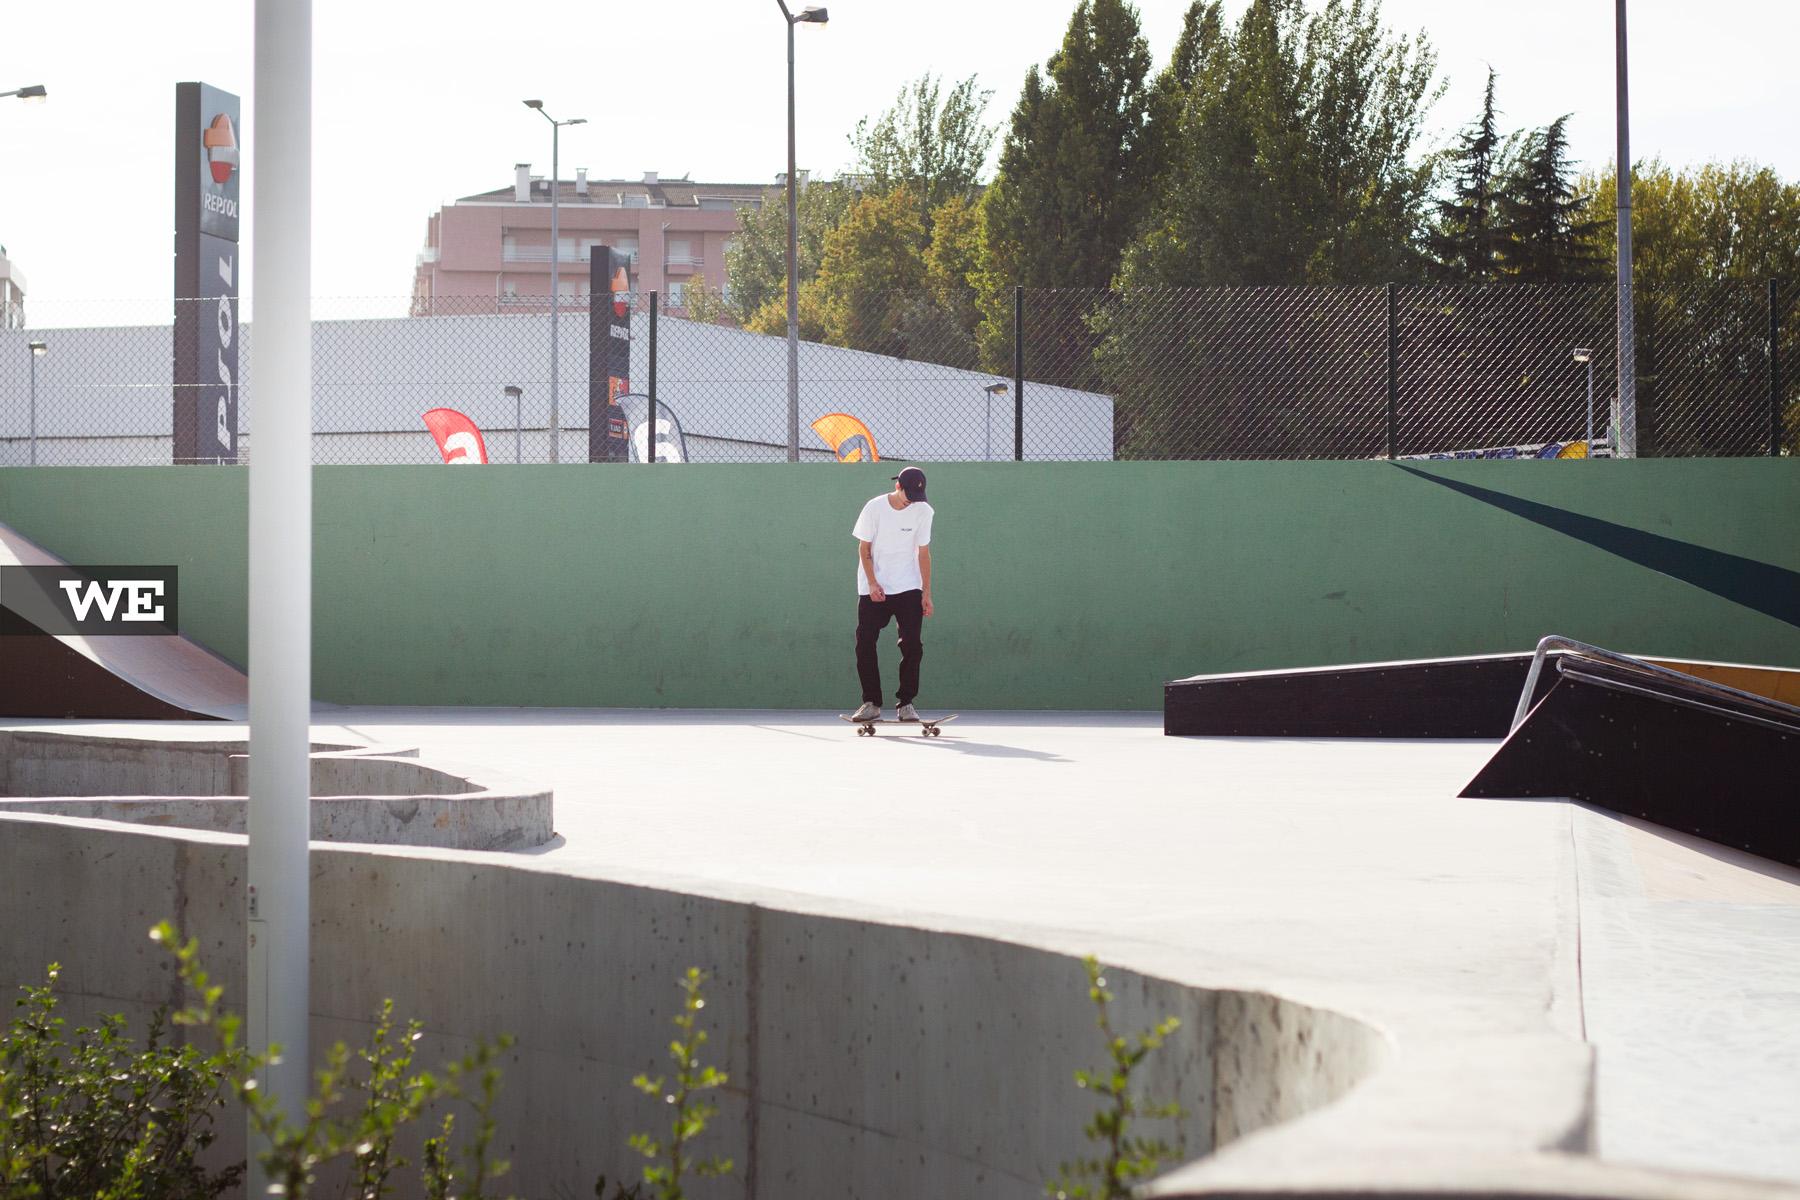 Parque Desportivo da Rodovia